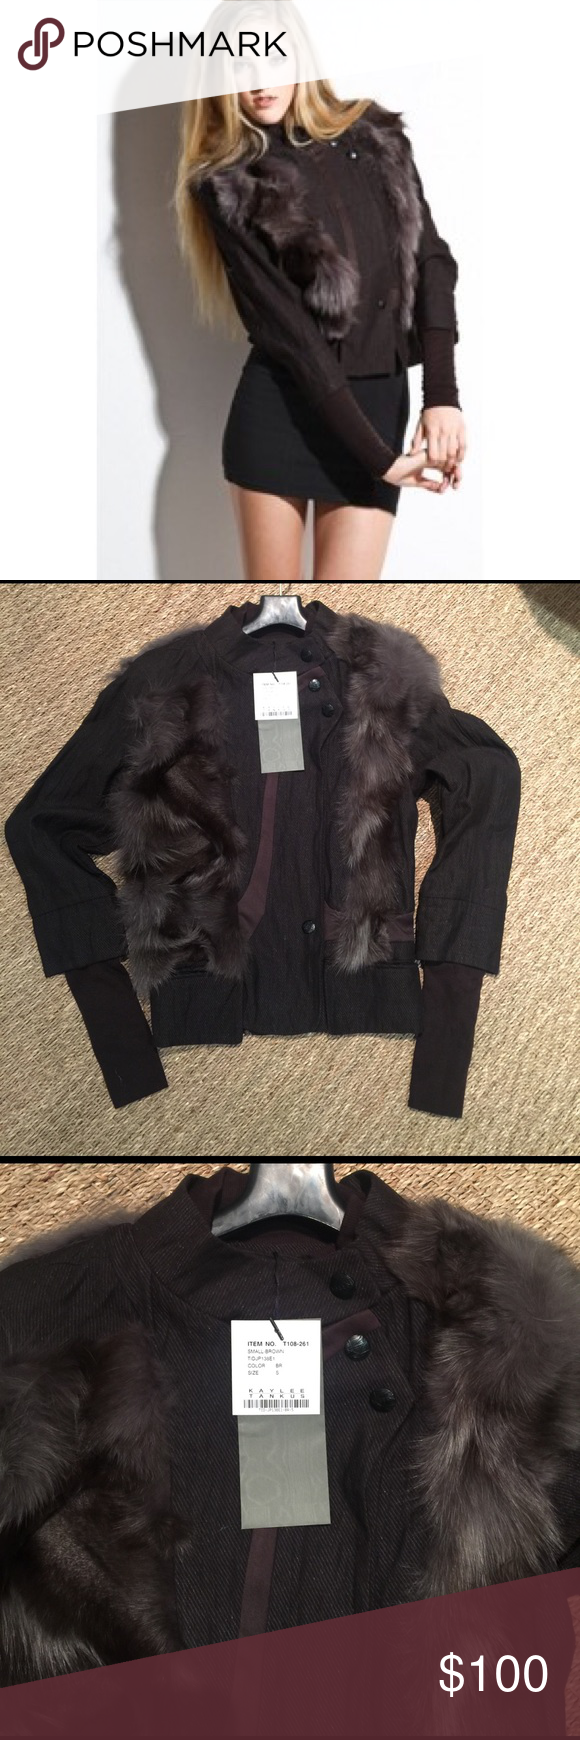 Kaylee Tankus woven jumper jacket brown fur Brand new with tags. kaylee tankus Jackets & Coats